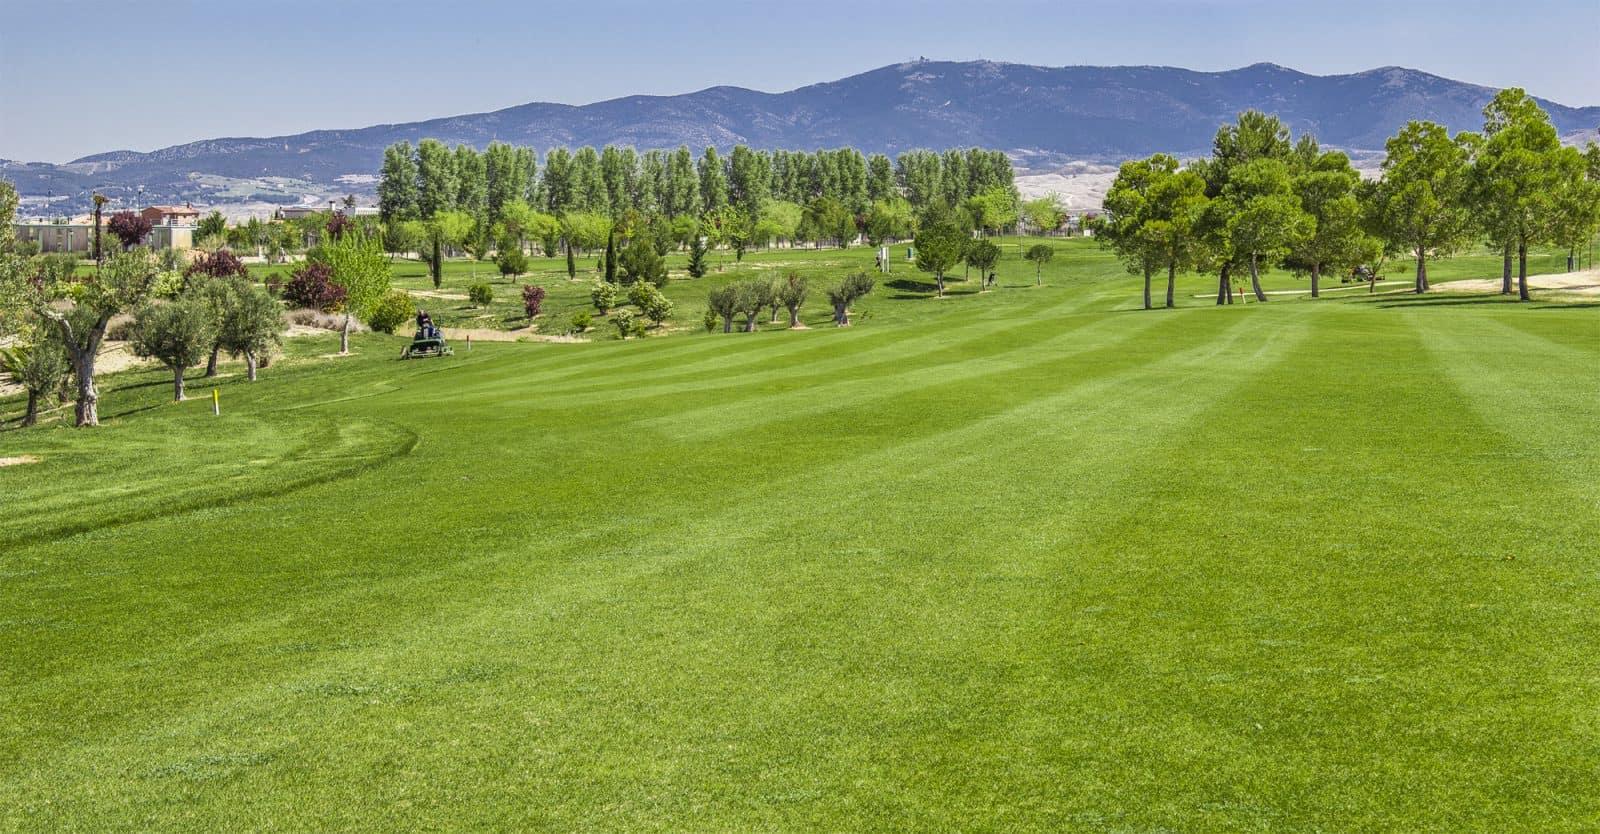 Calendario - Club de Golf Calatayud